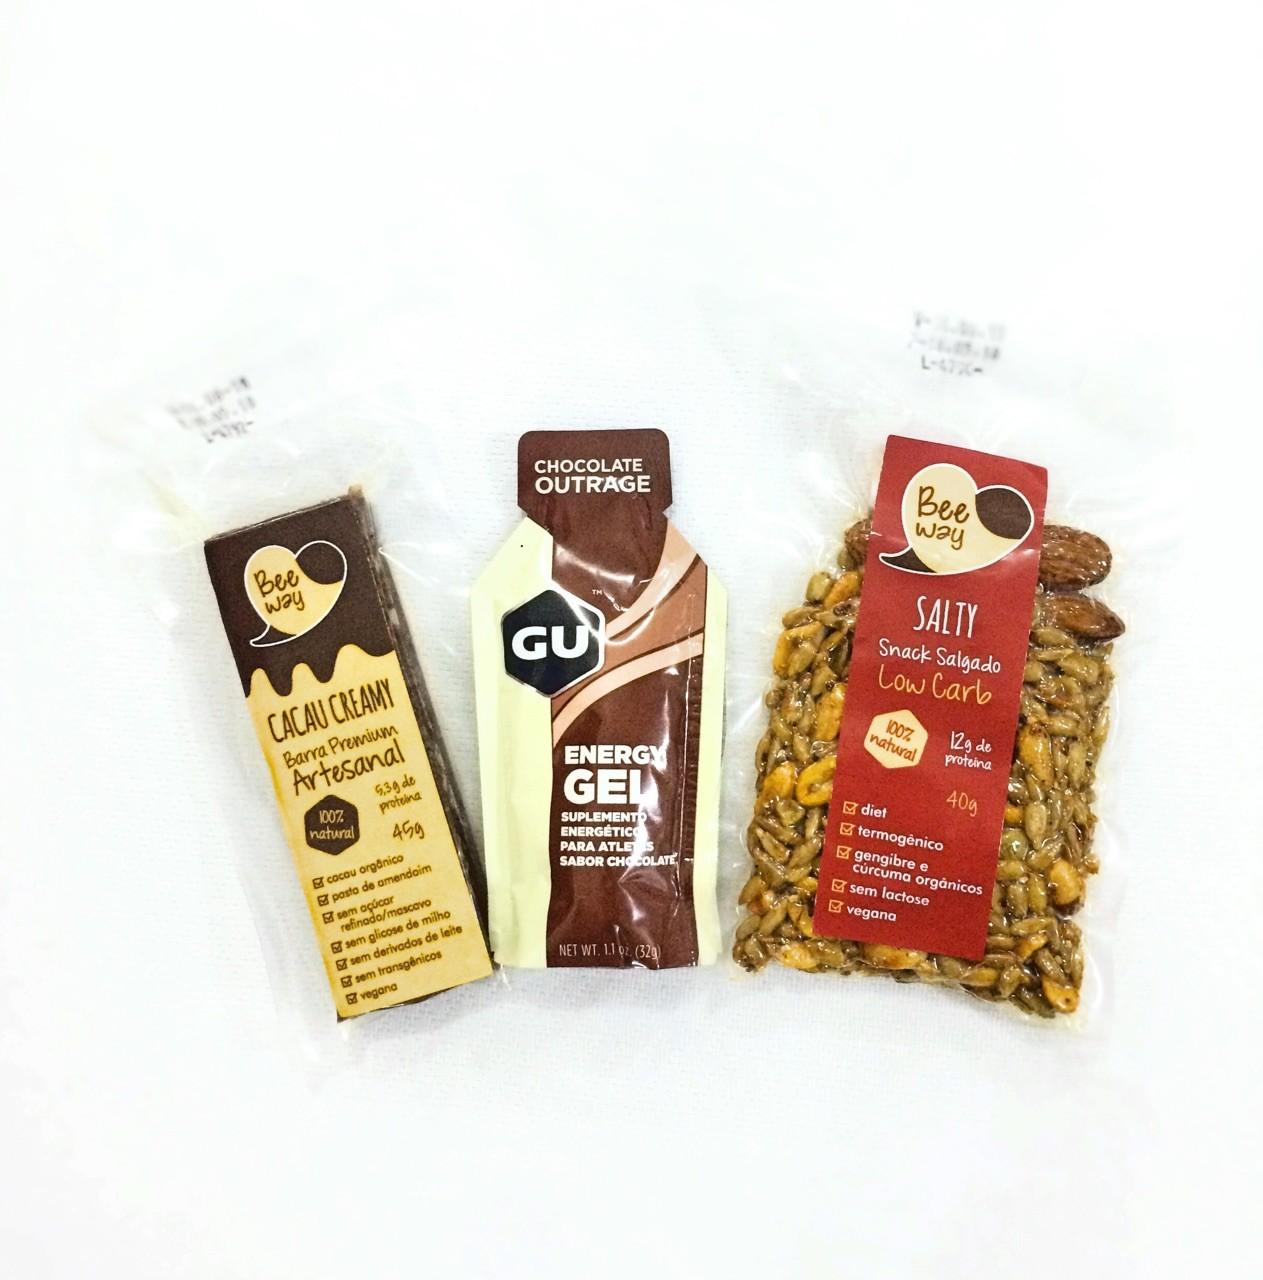 Kit Nutritivo Treino BeeWay/gu gel